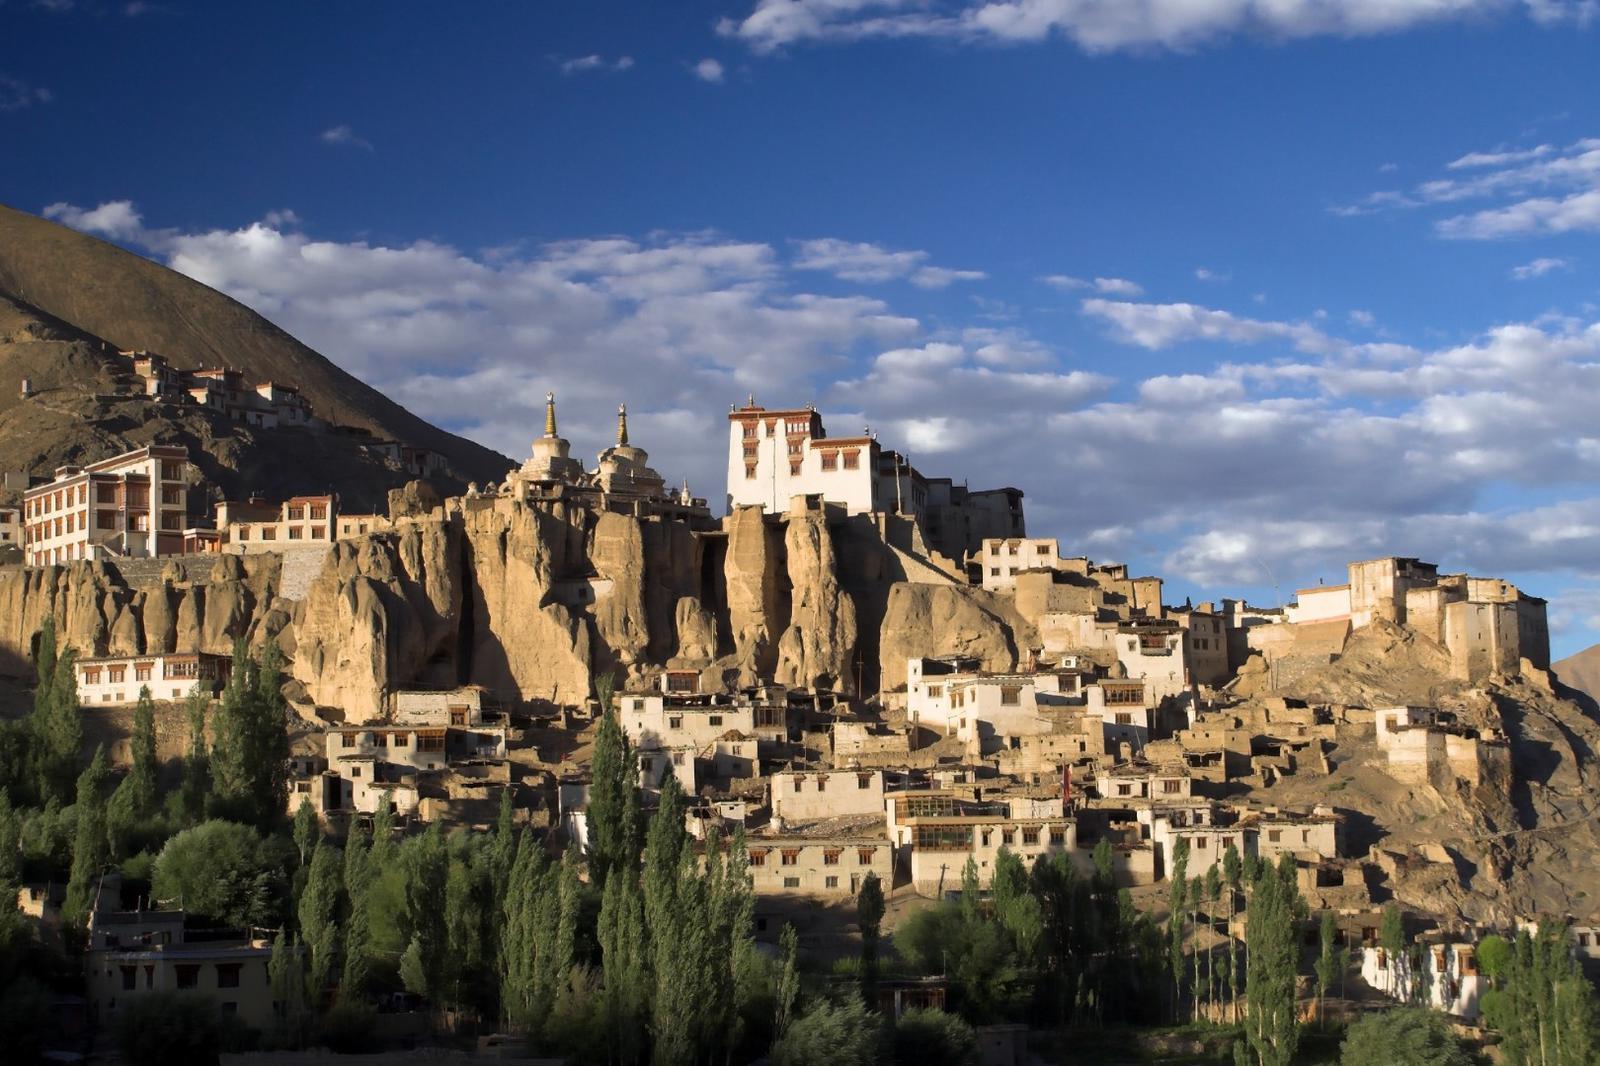 Lamayuru monastery in Ladakh in India